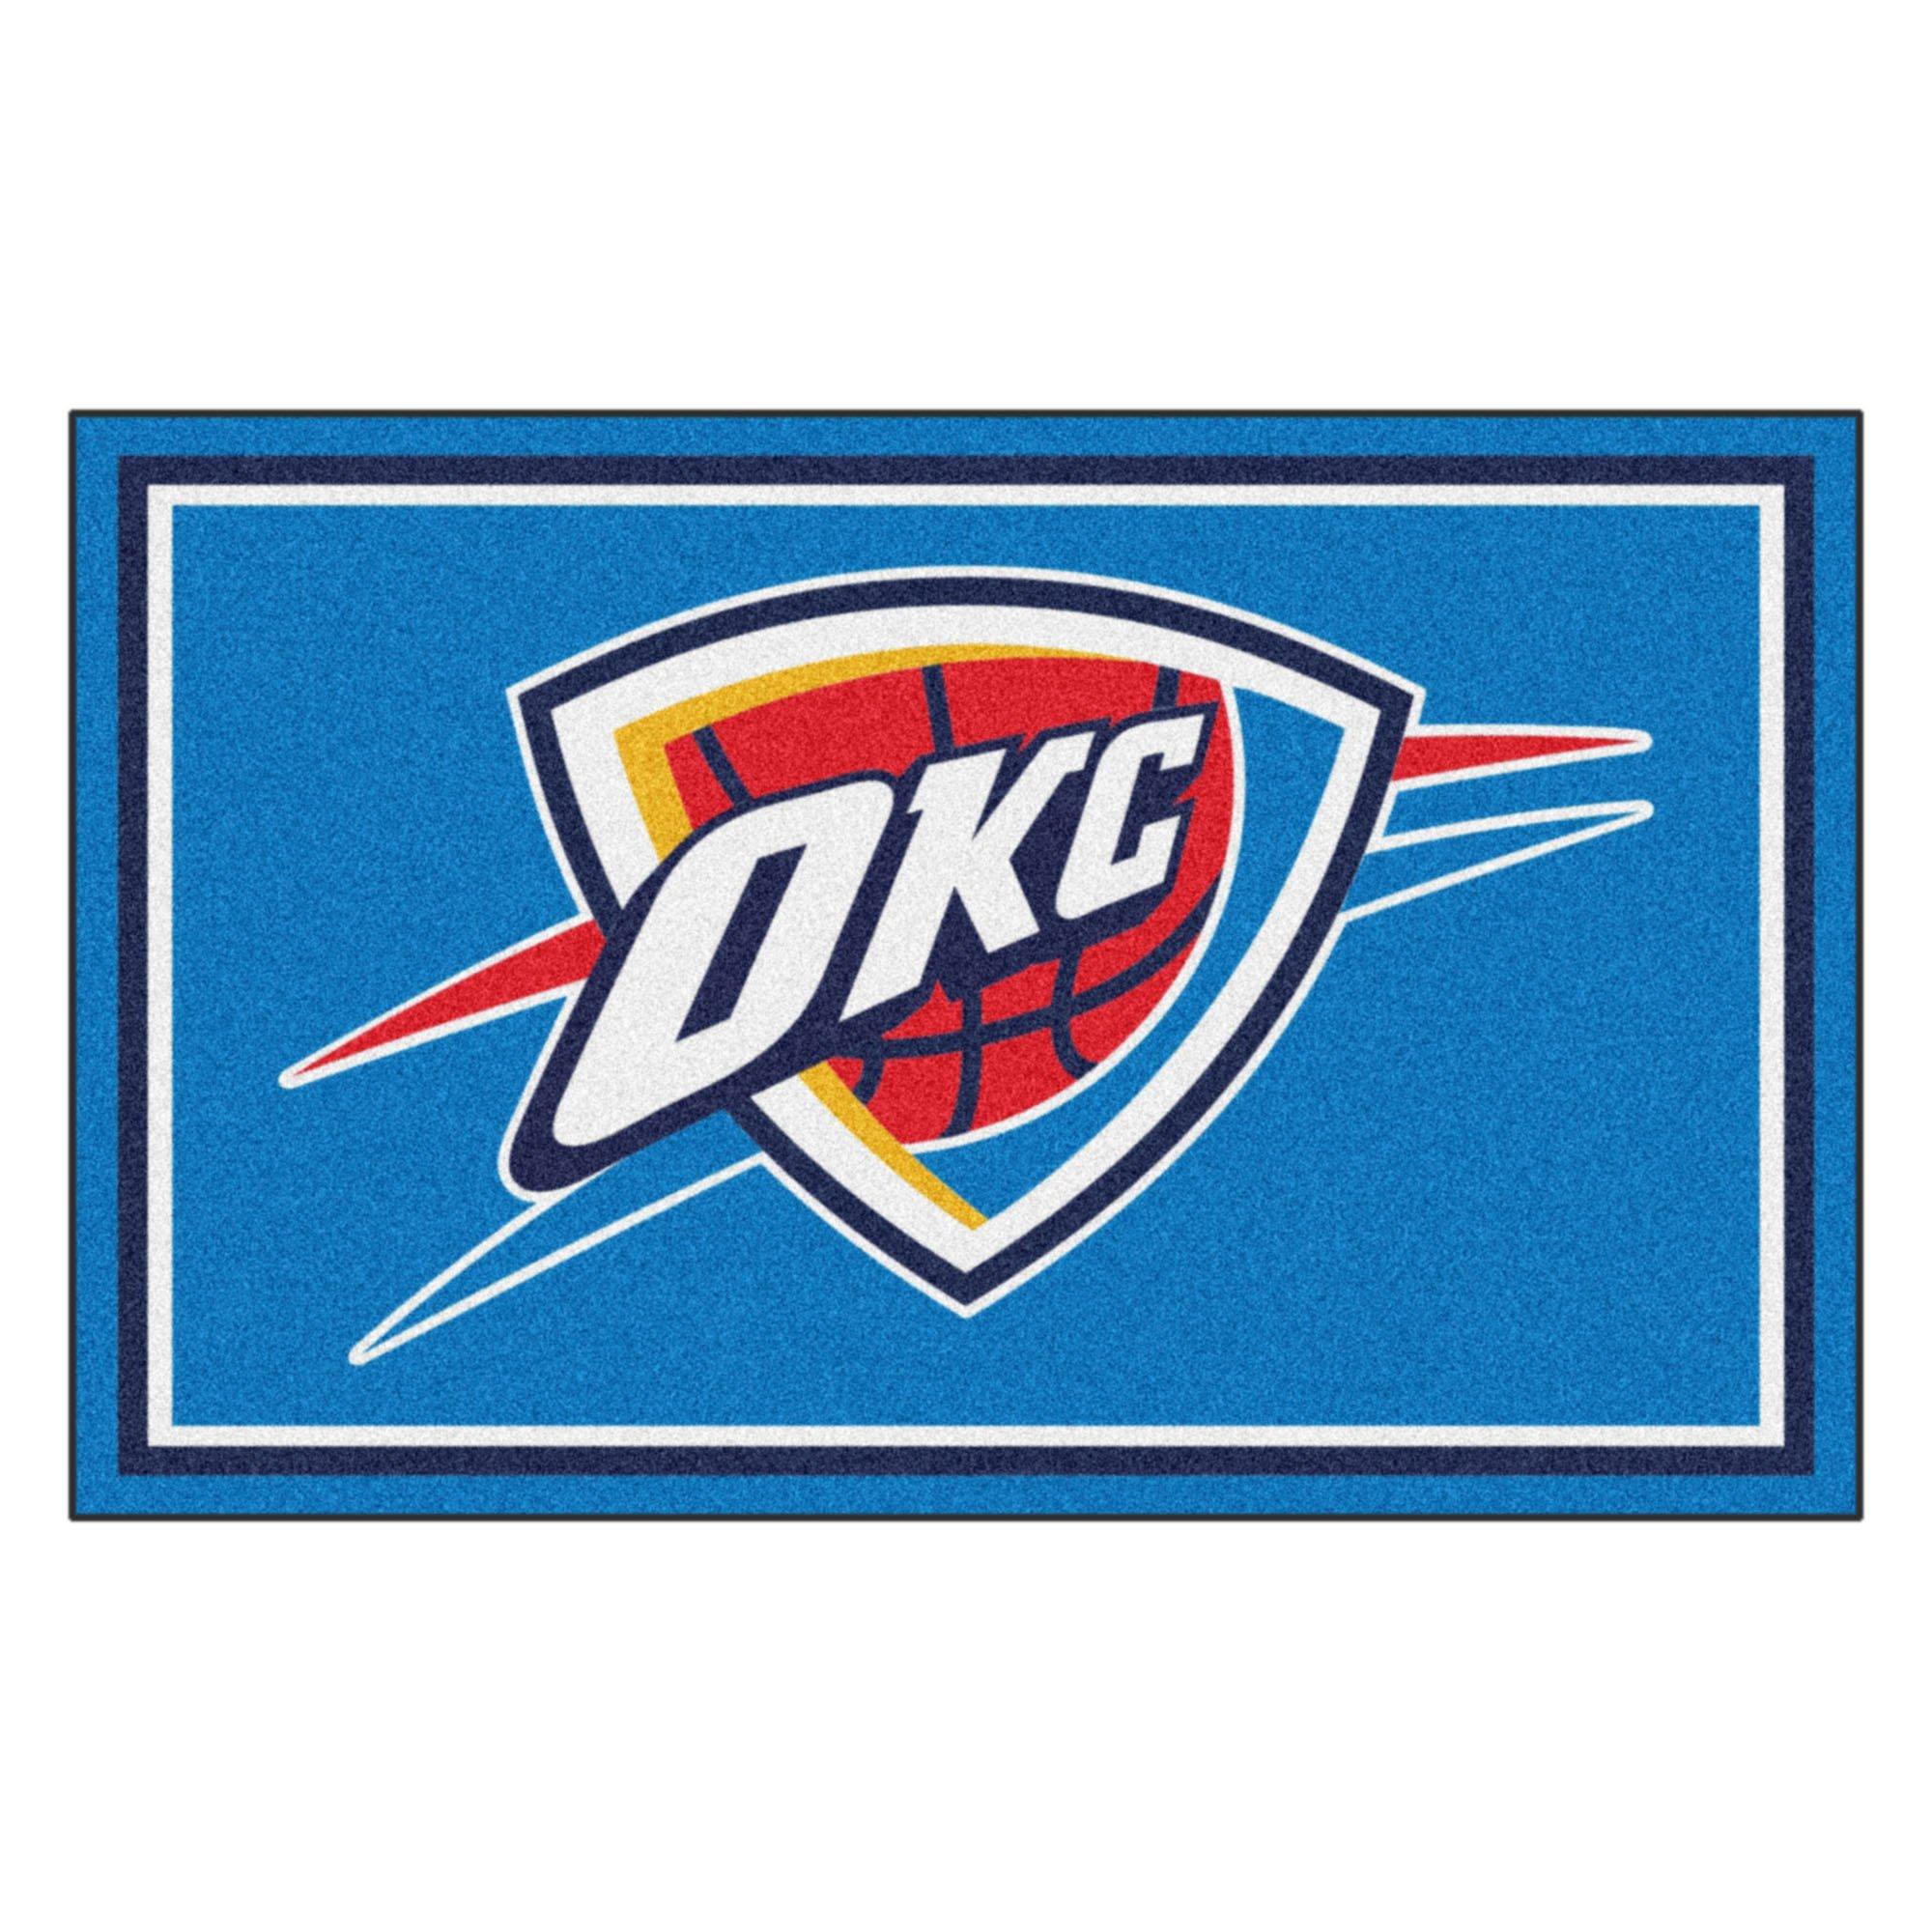 FANMATS 20438 NBA - Oklahoma City Thunder 4'X6' Rug, Team Color, 44''x71''